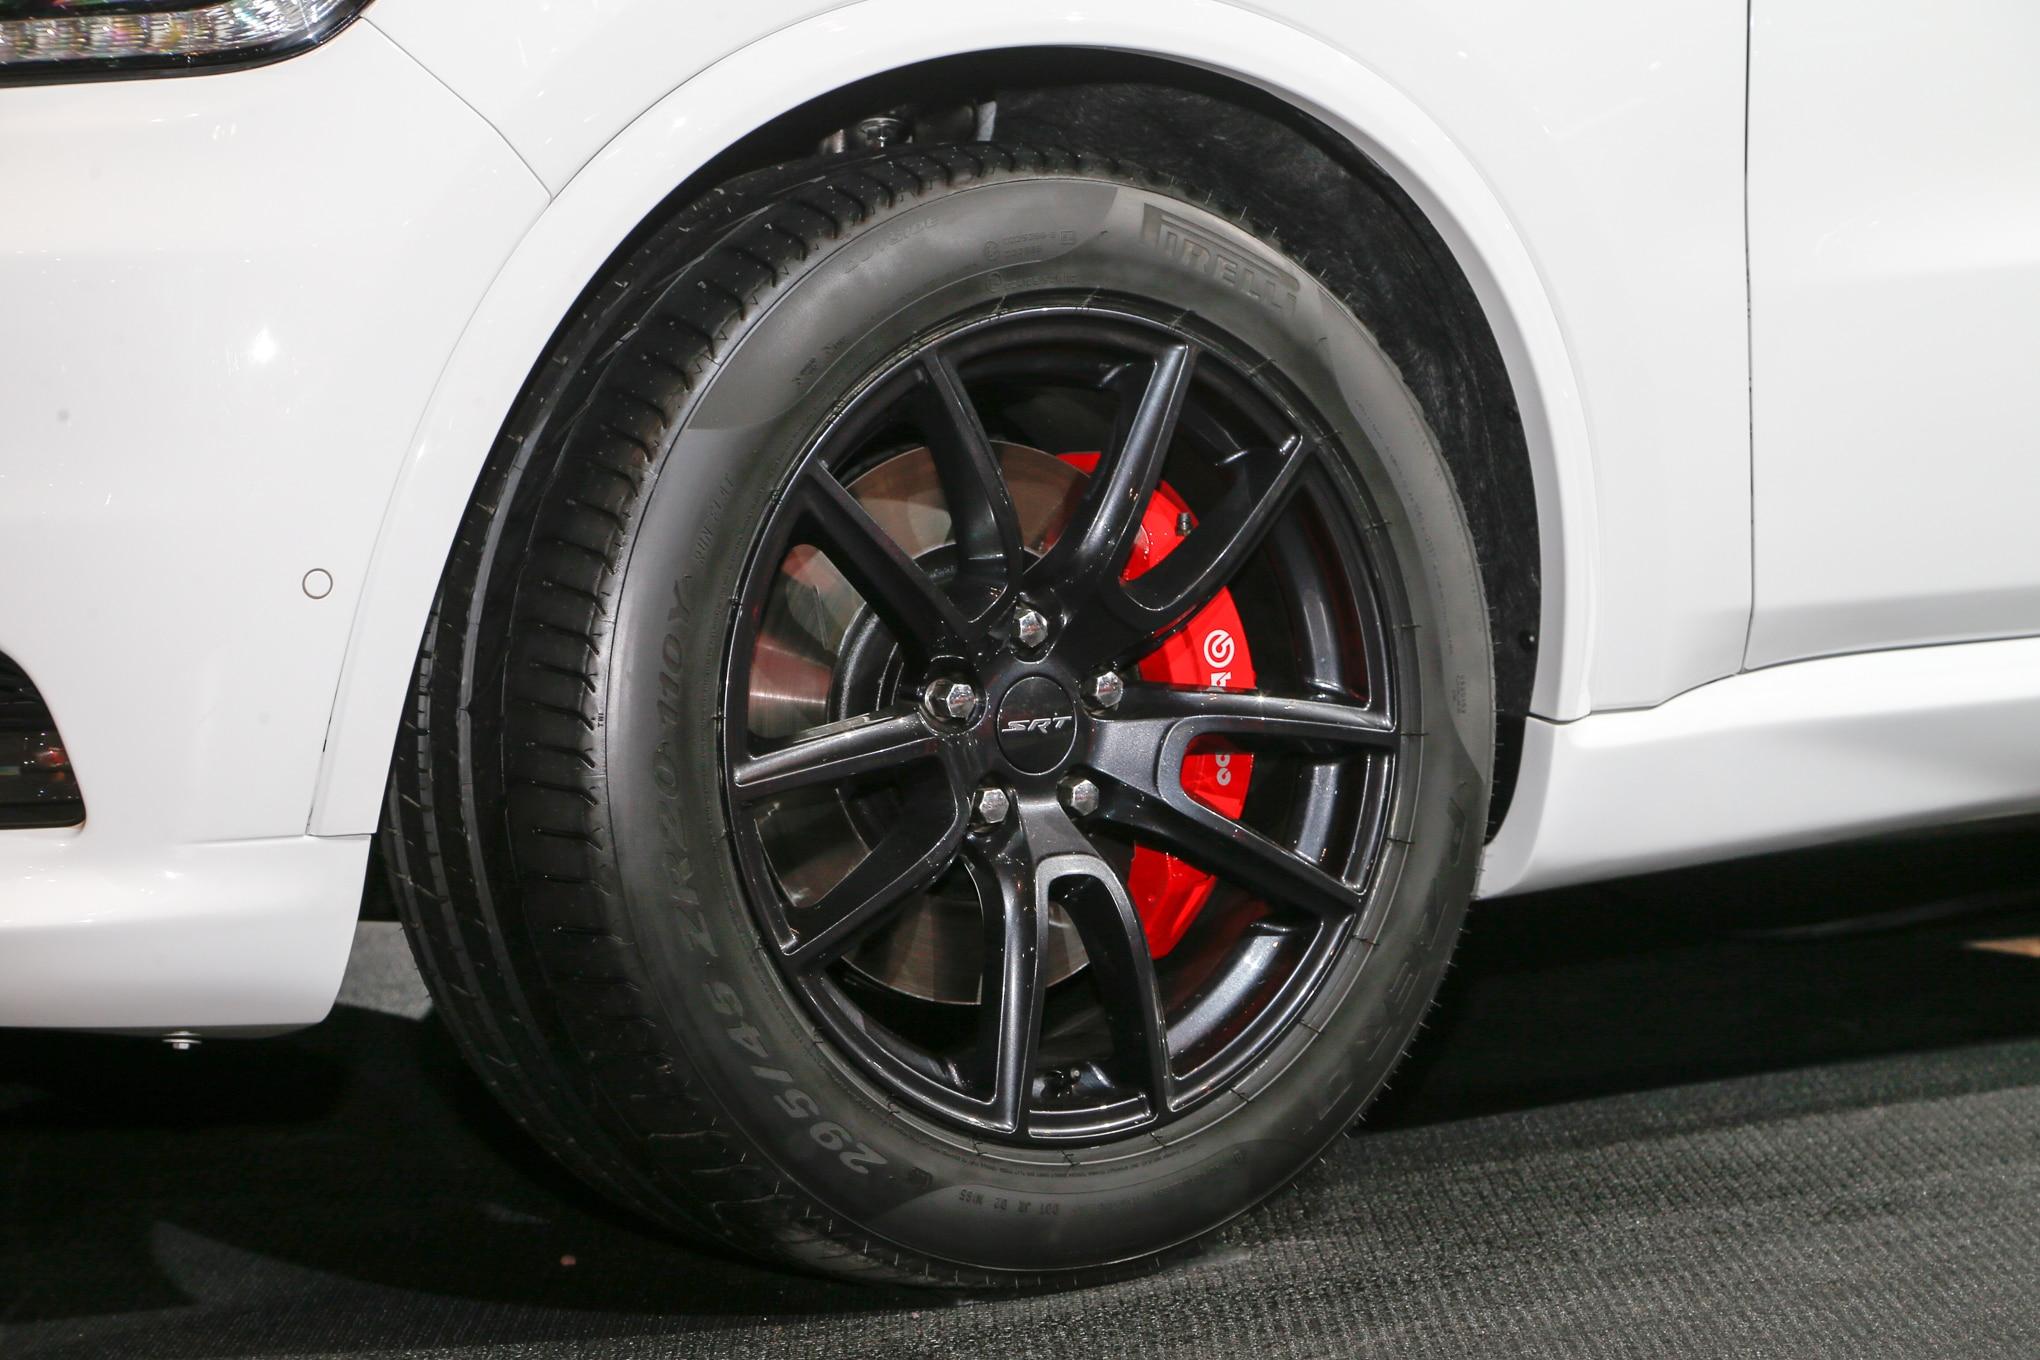 2018 Dodge Durango SRT First Look | Automobile Magazine